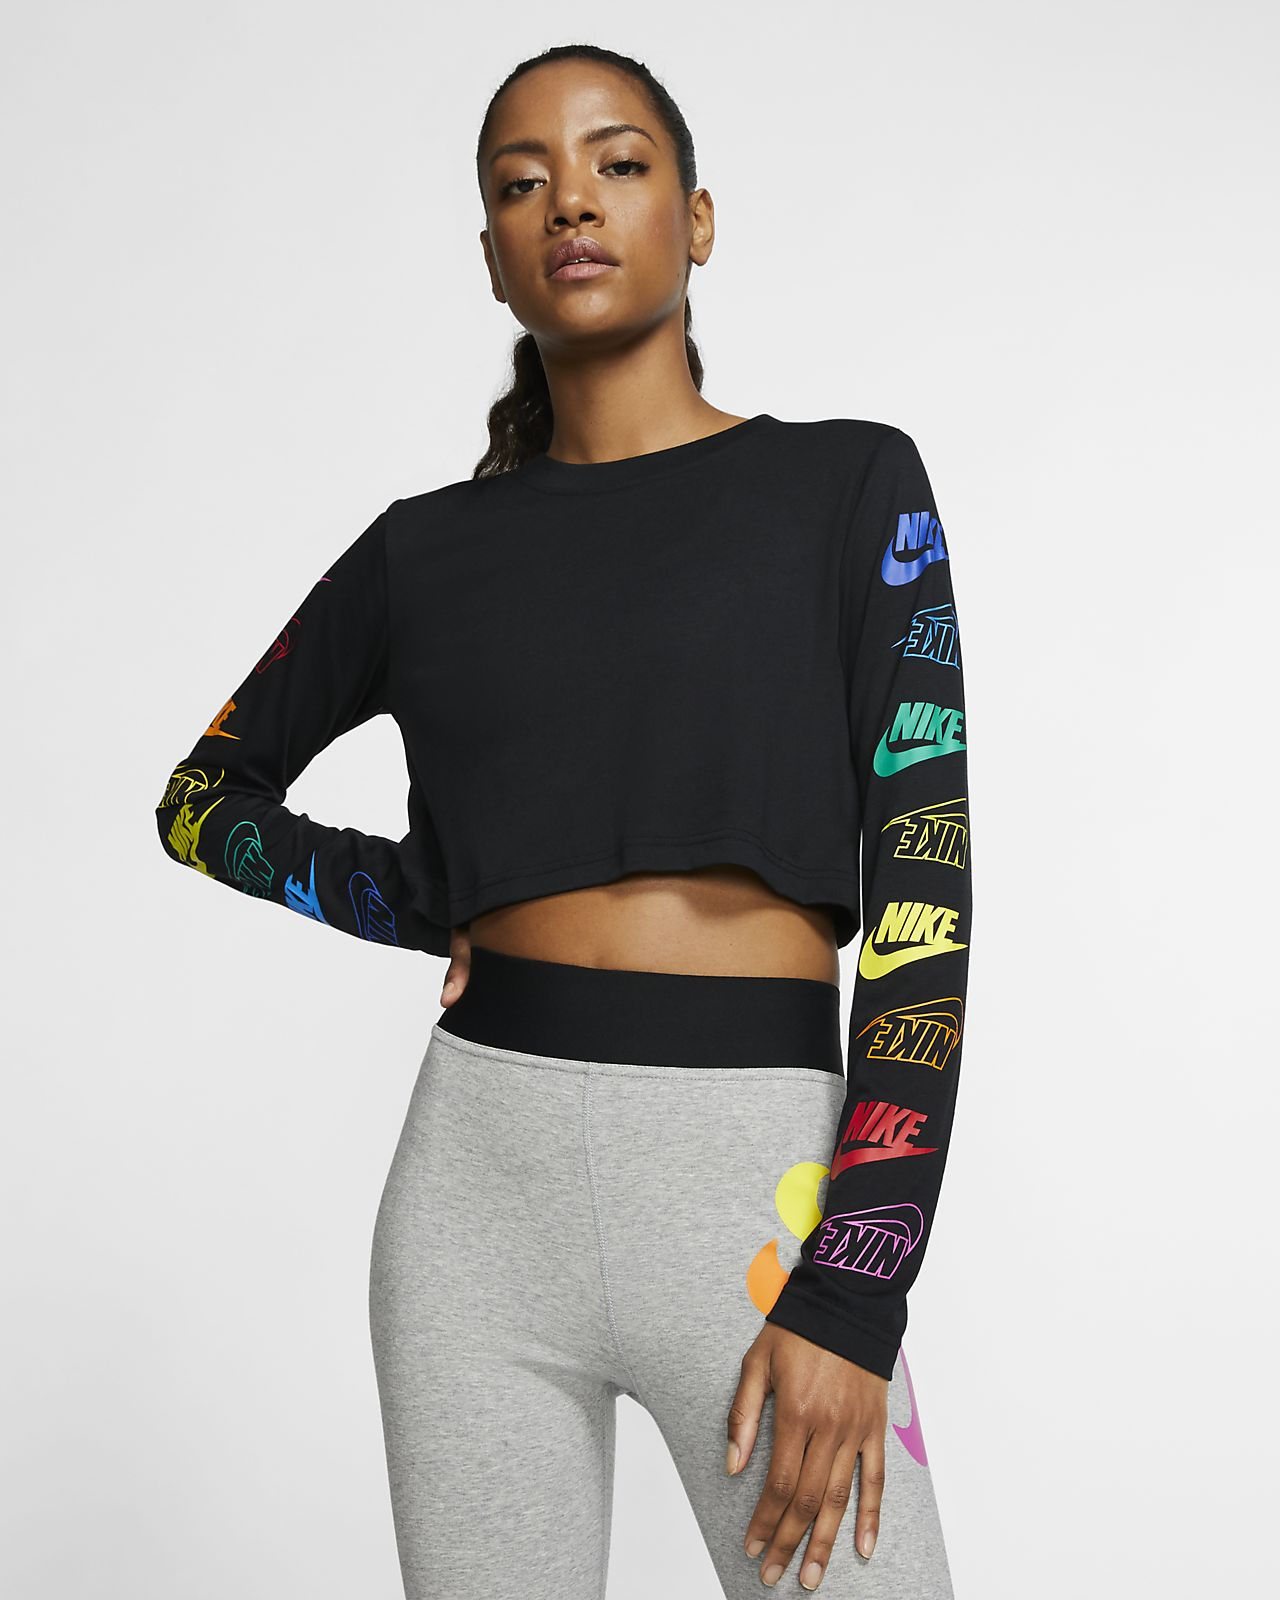 Nike Sportswear Langarm T Shirt für Damen